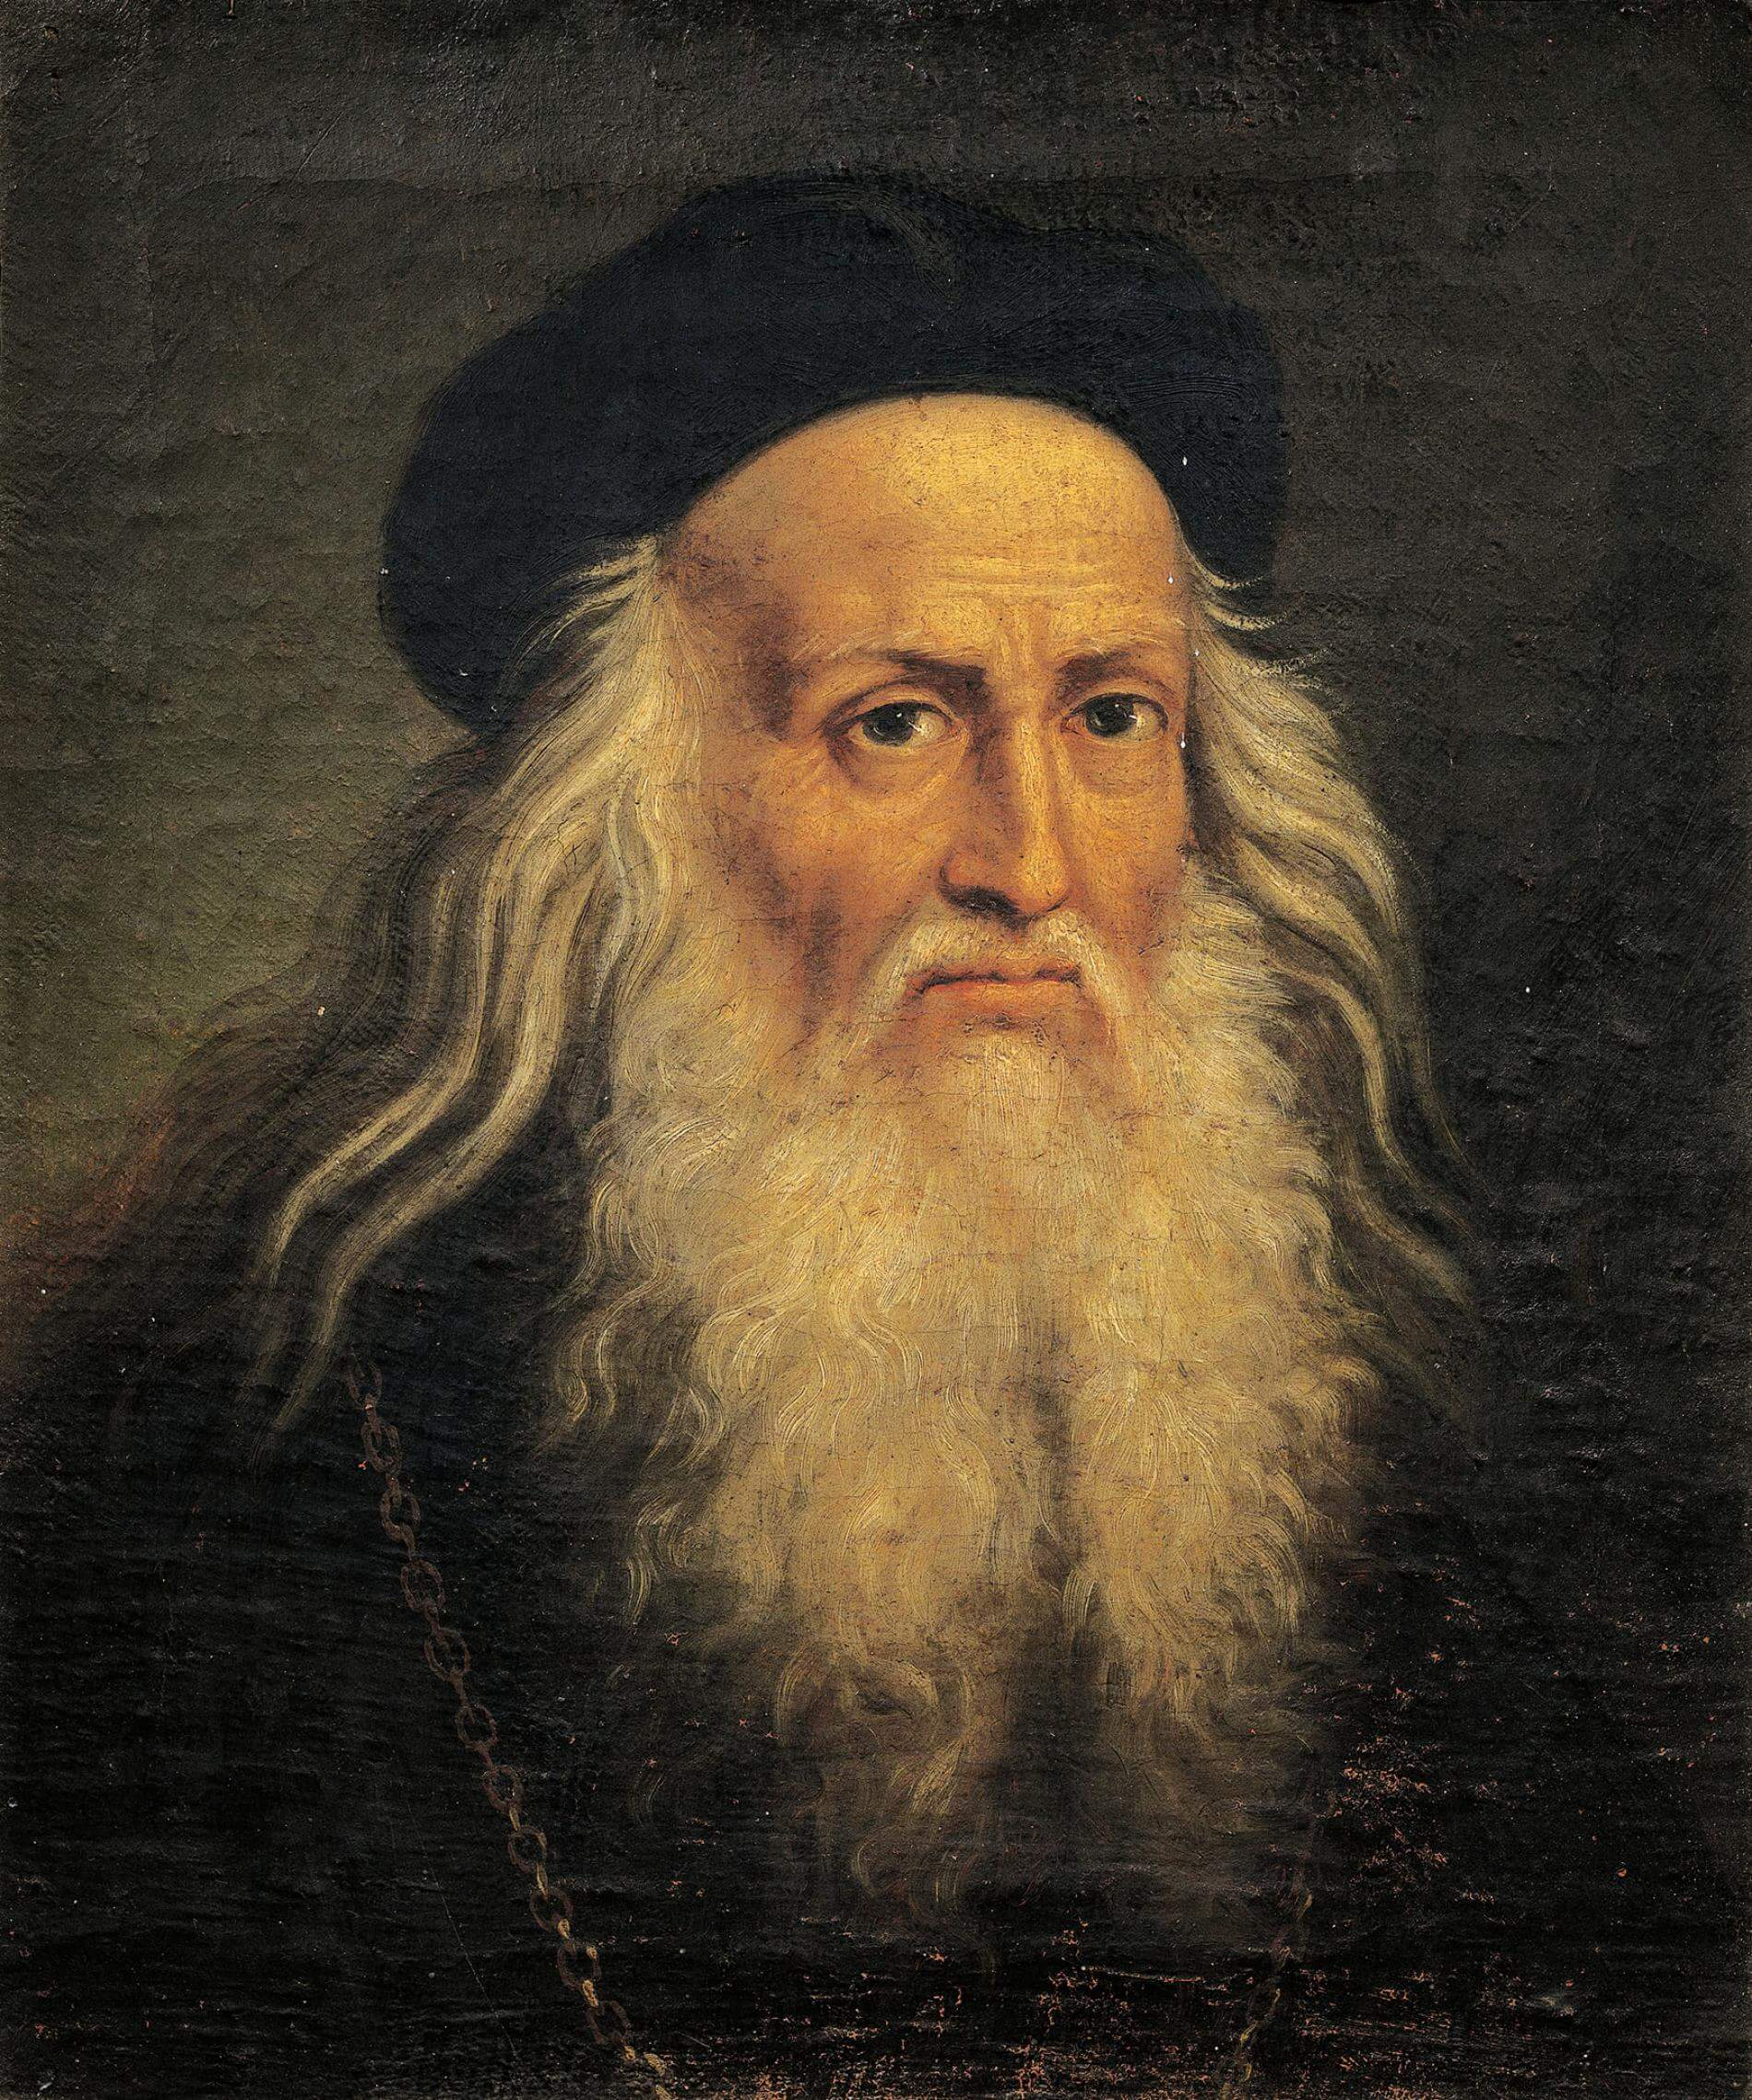 Leonardo da Vinci's Best Work